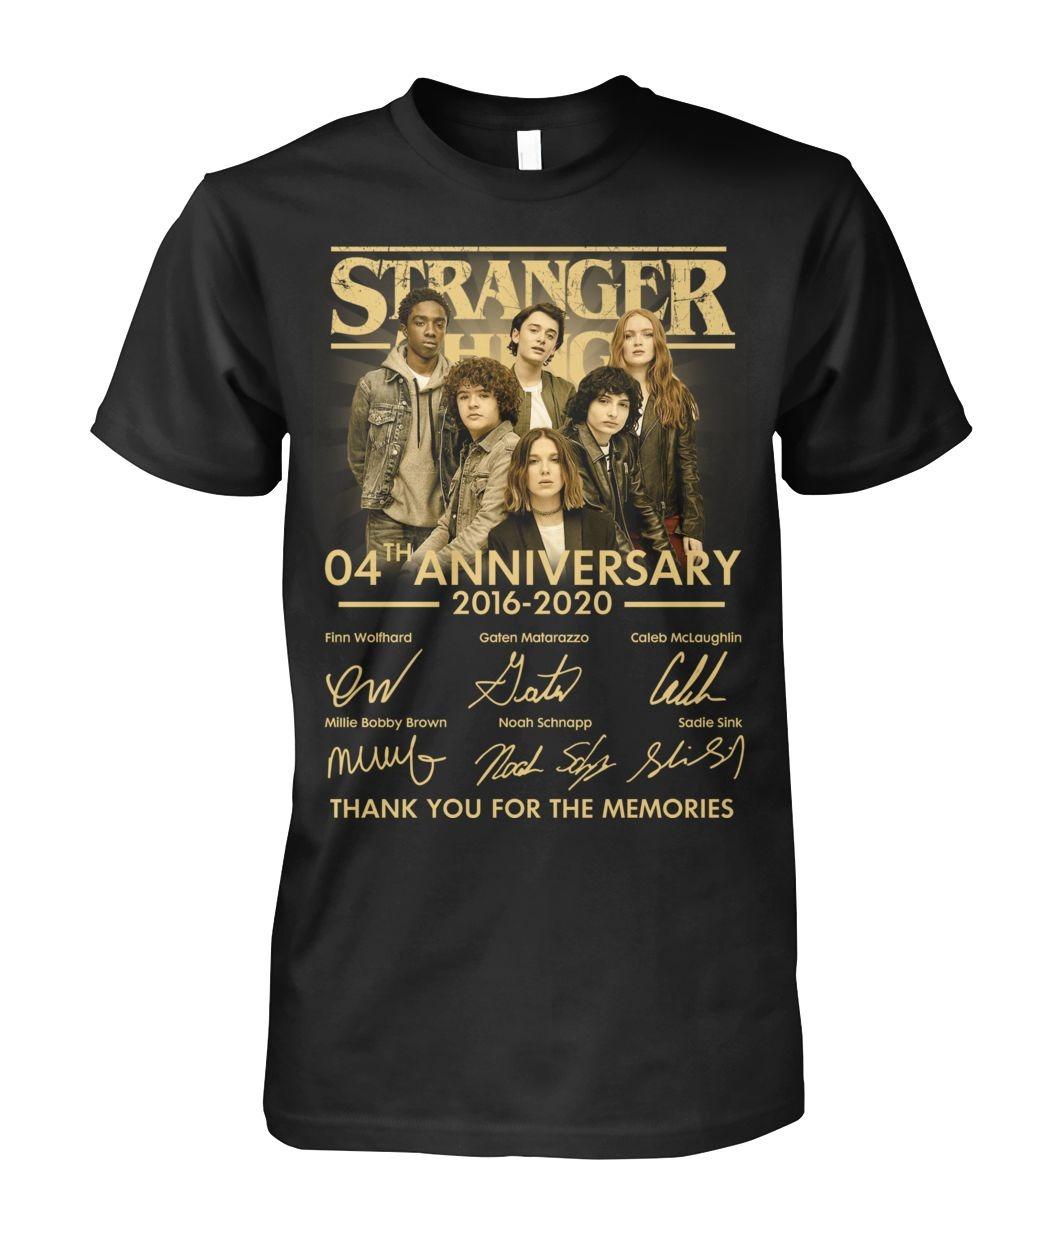 Stranger Things 04th Anniversary T-shirt